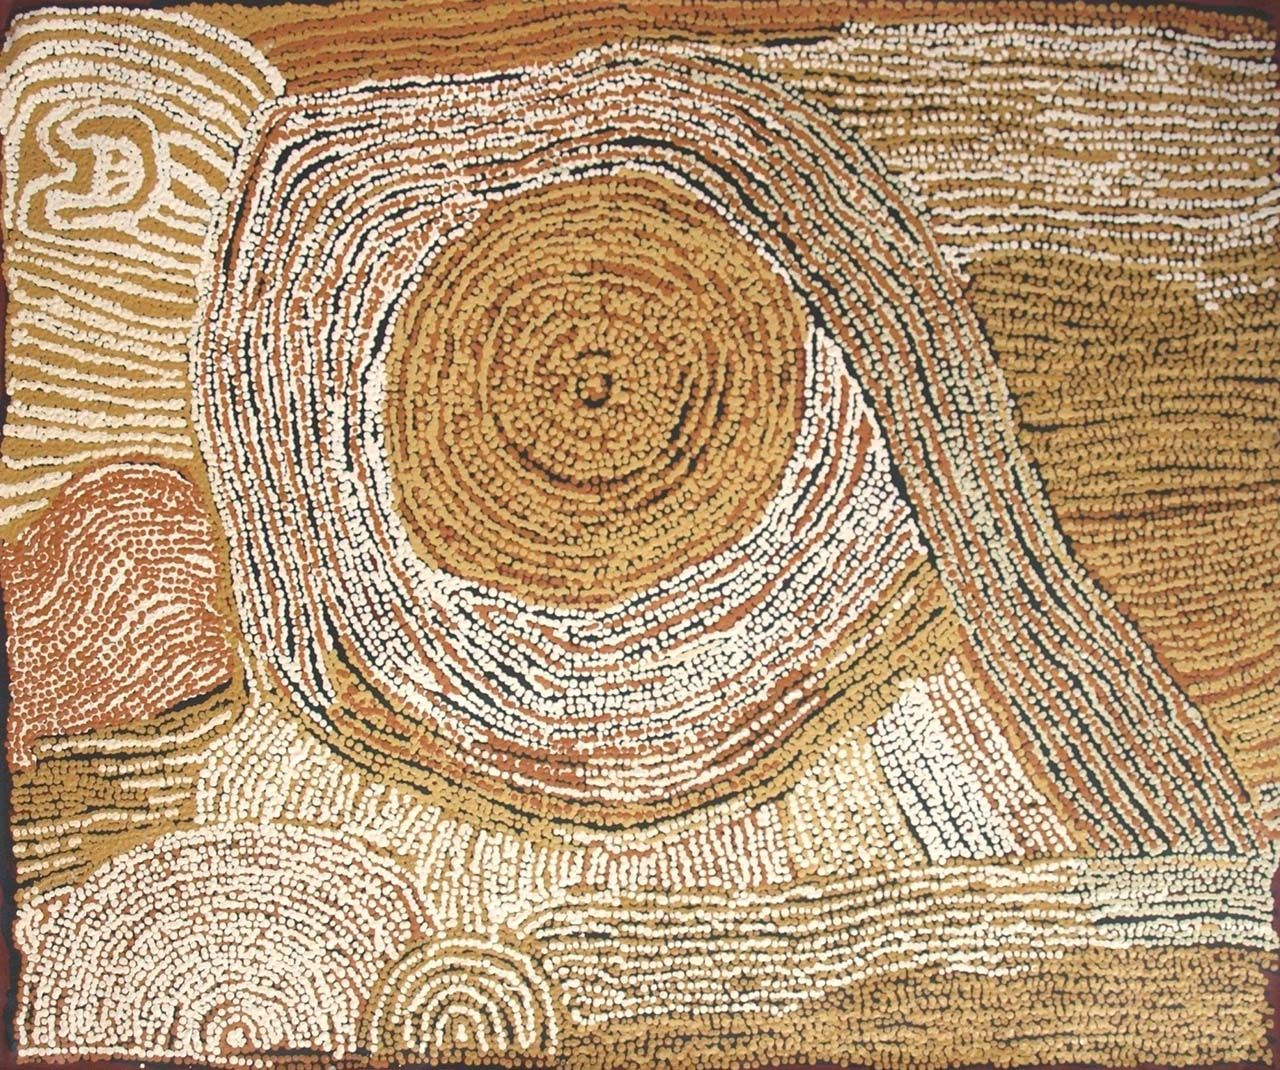 Colours Of The Earth Aboriginal Art Online Exhibition Aboriginal